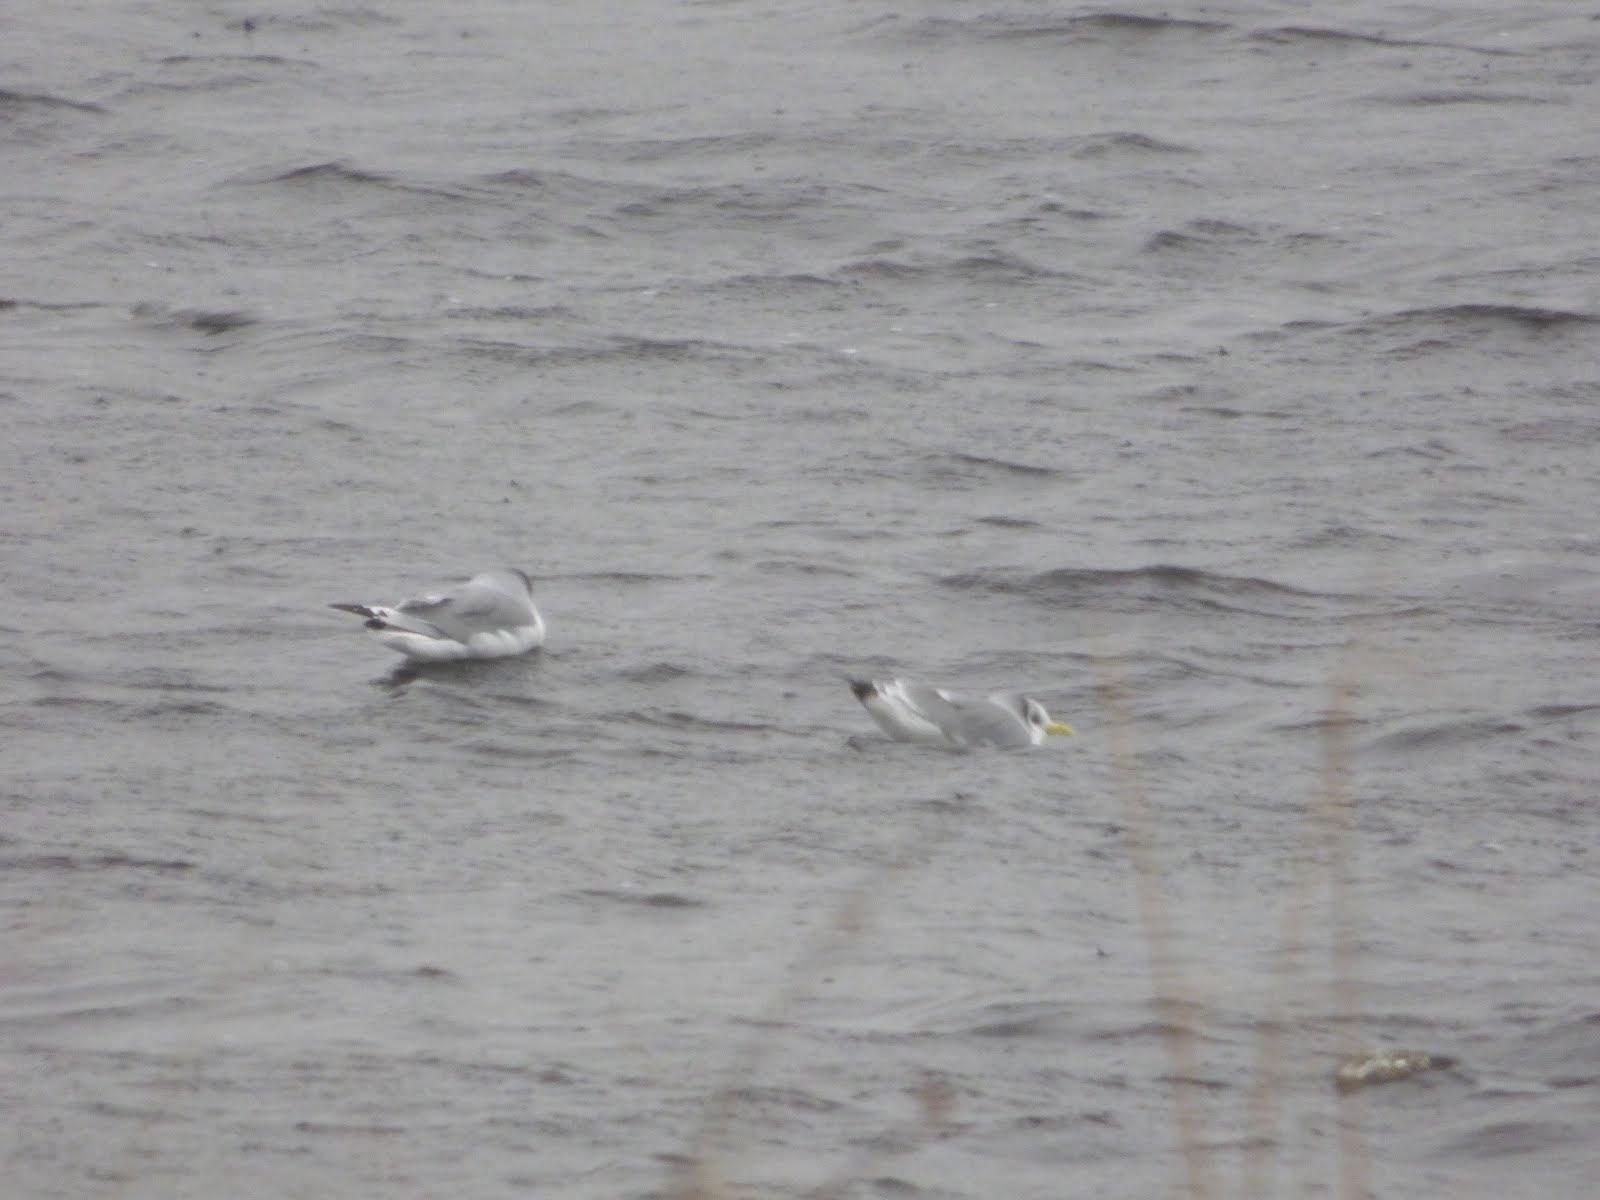 Leeshaw Reservoir 21/11/16